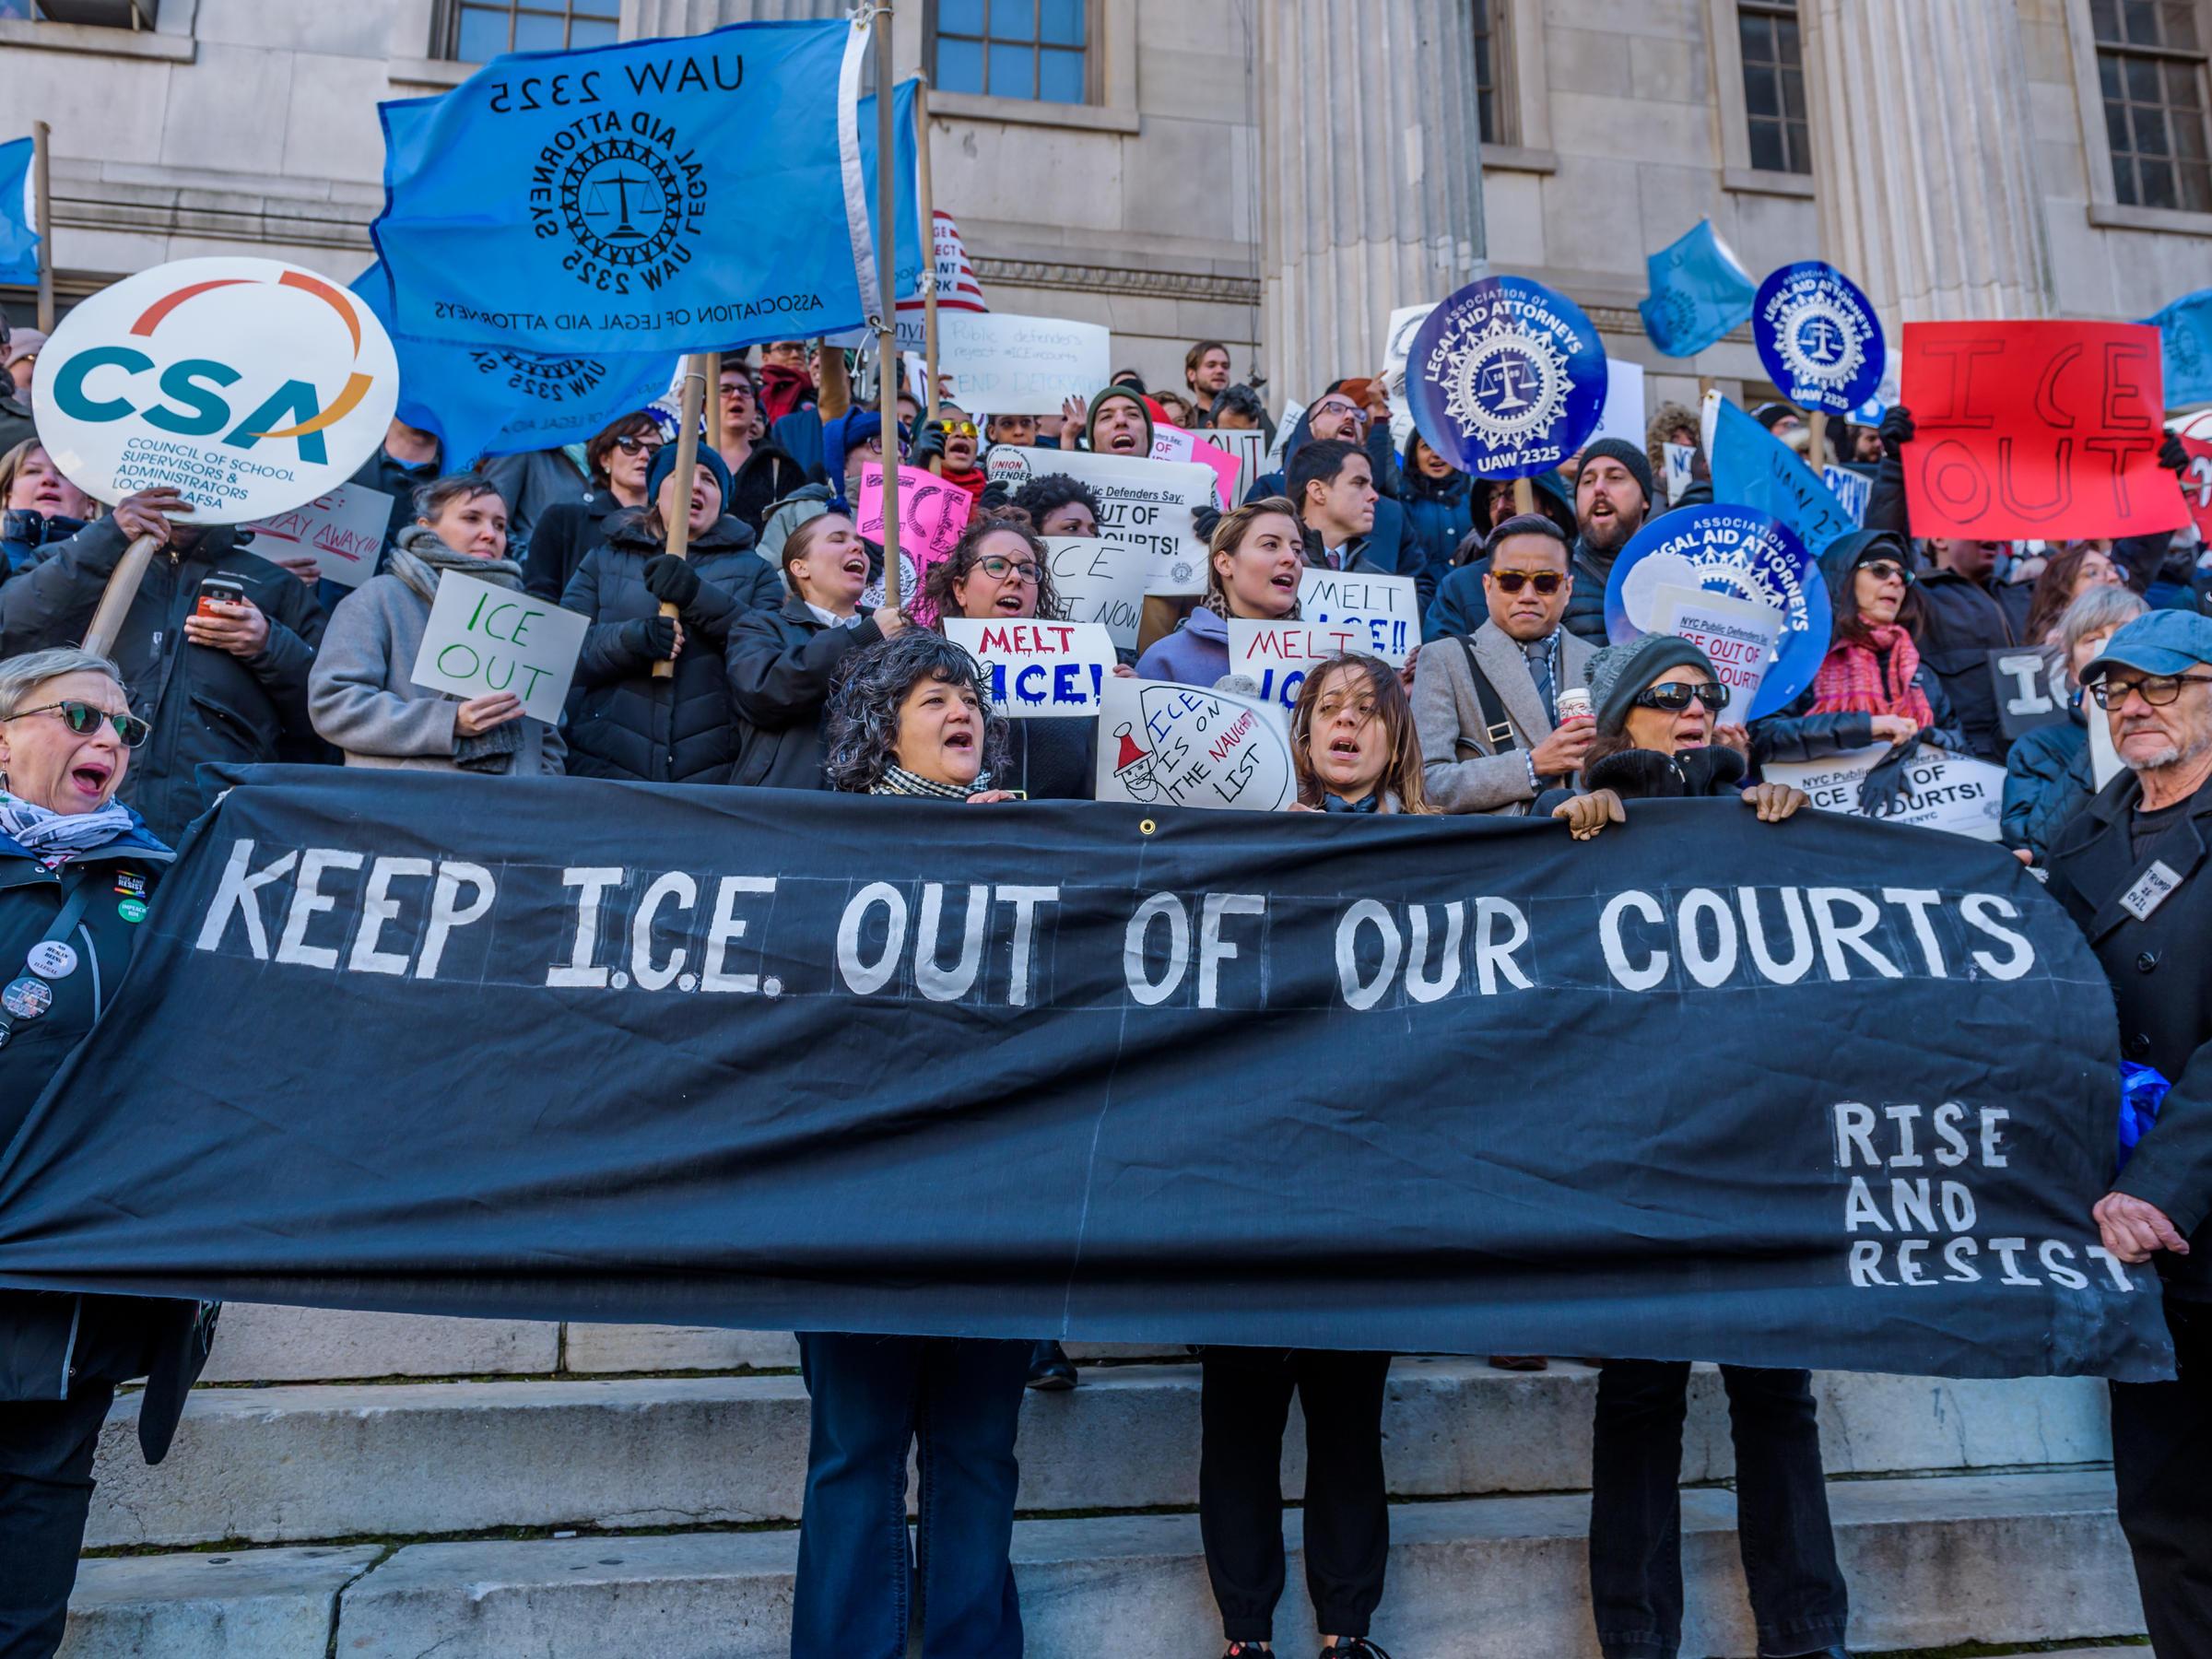 Court association arizona teen courts necessary